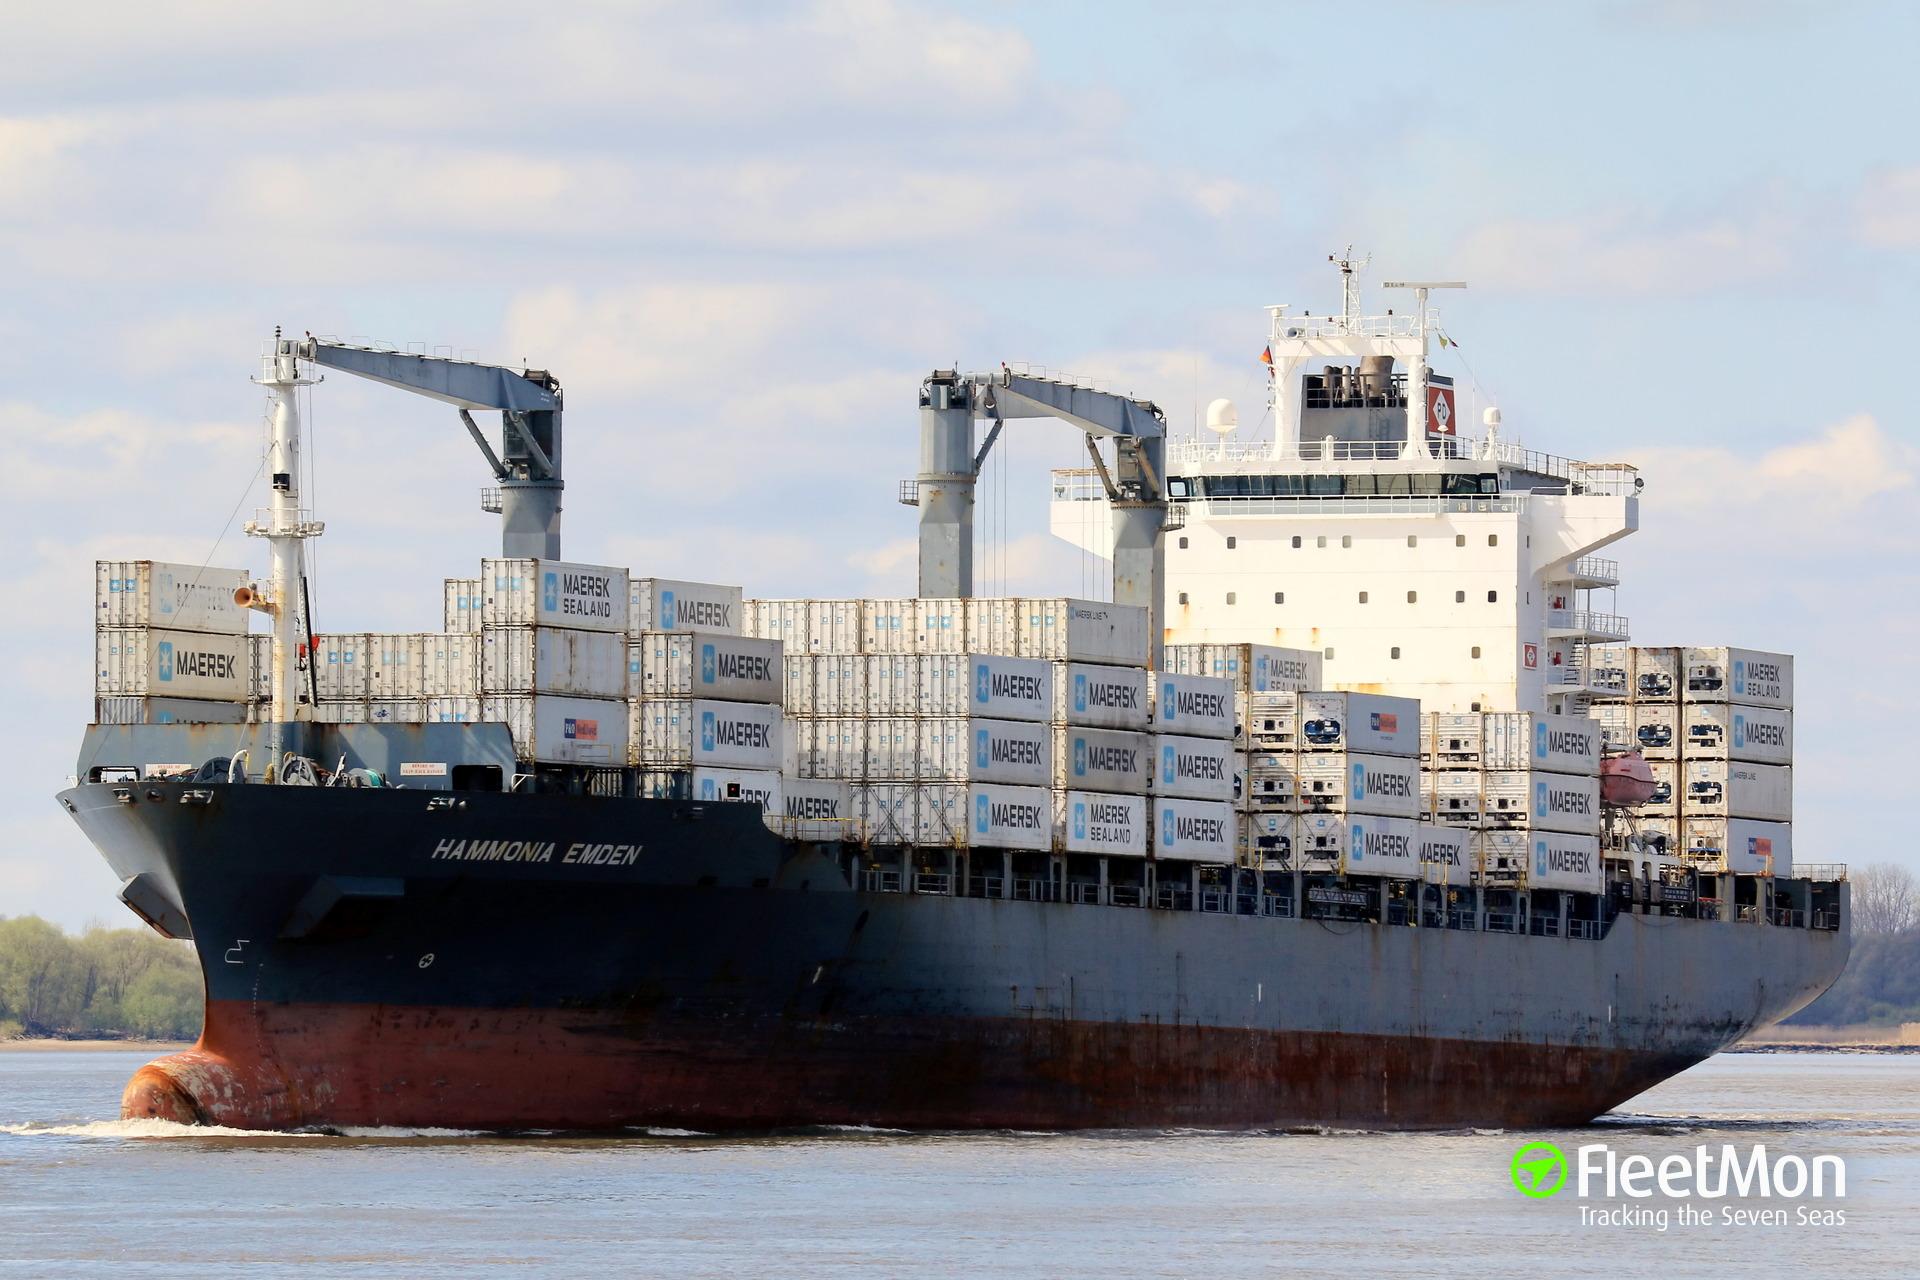 Cocaine found in container on board of HAMMONIA EMDEN, Colombia